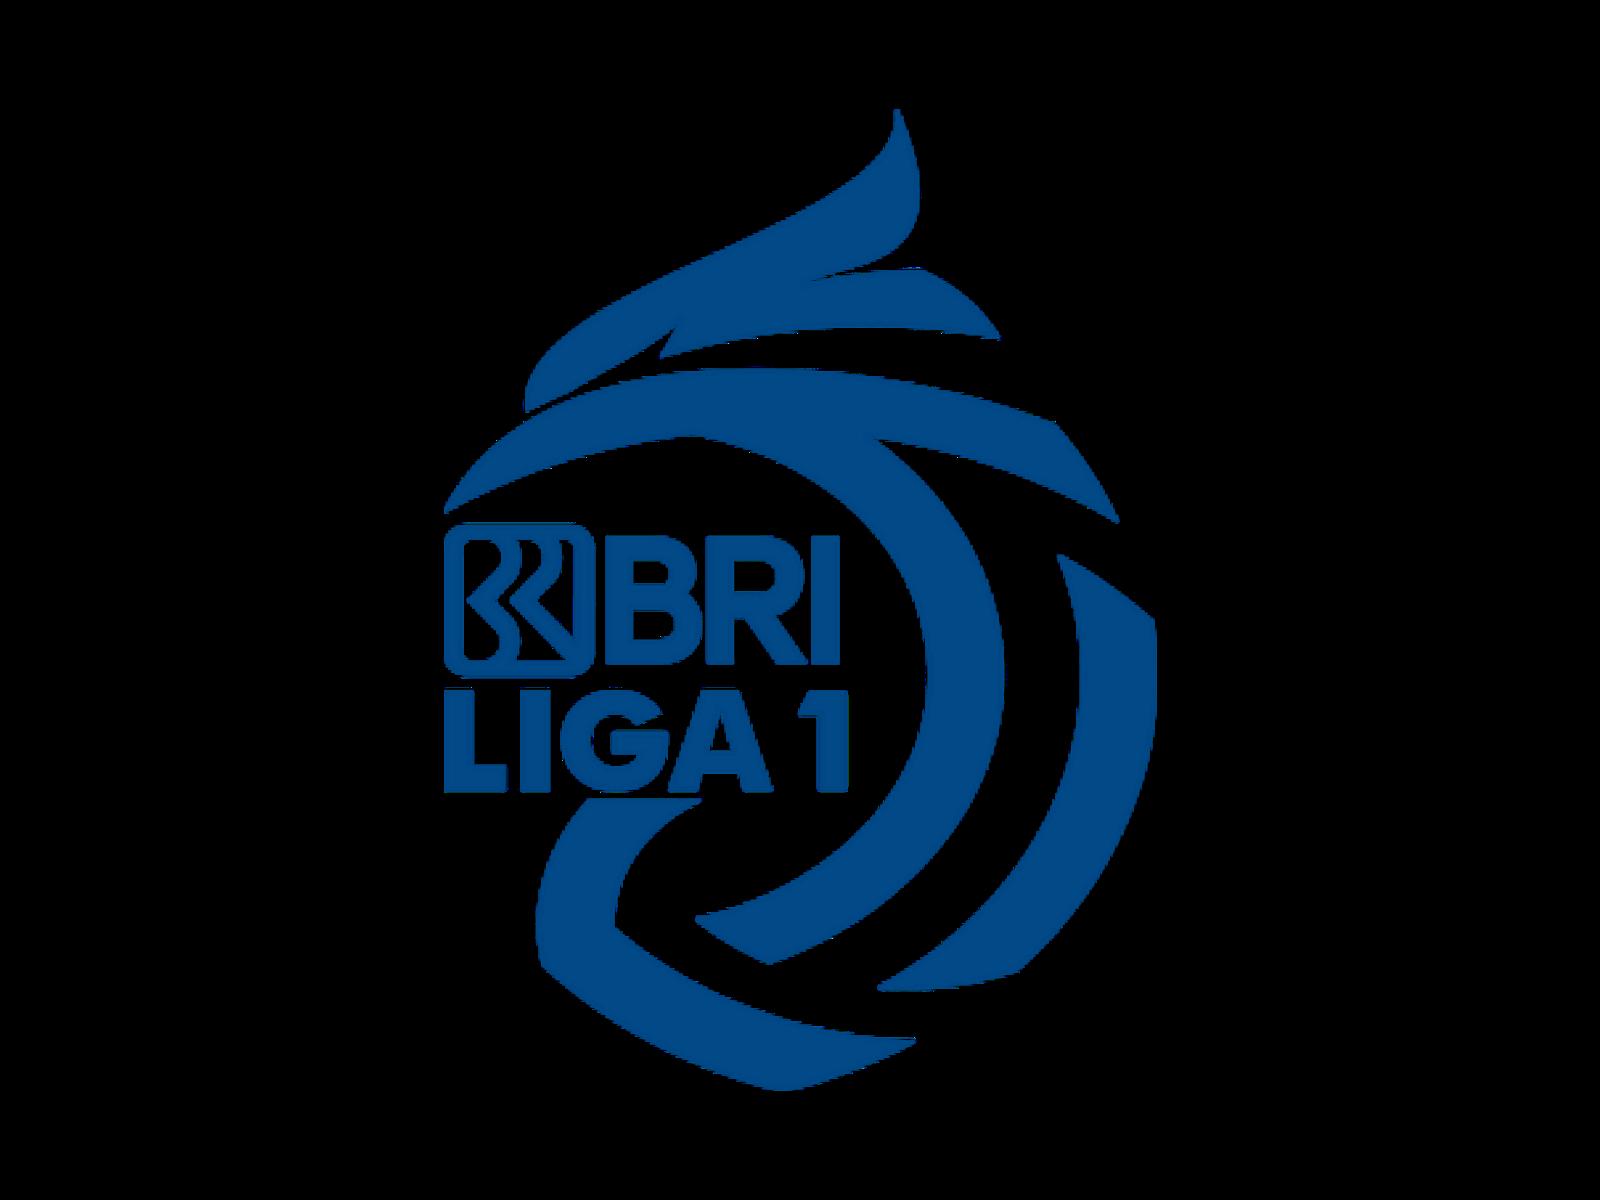 Logo BRI Liga 1 Format PNG